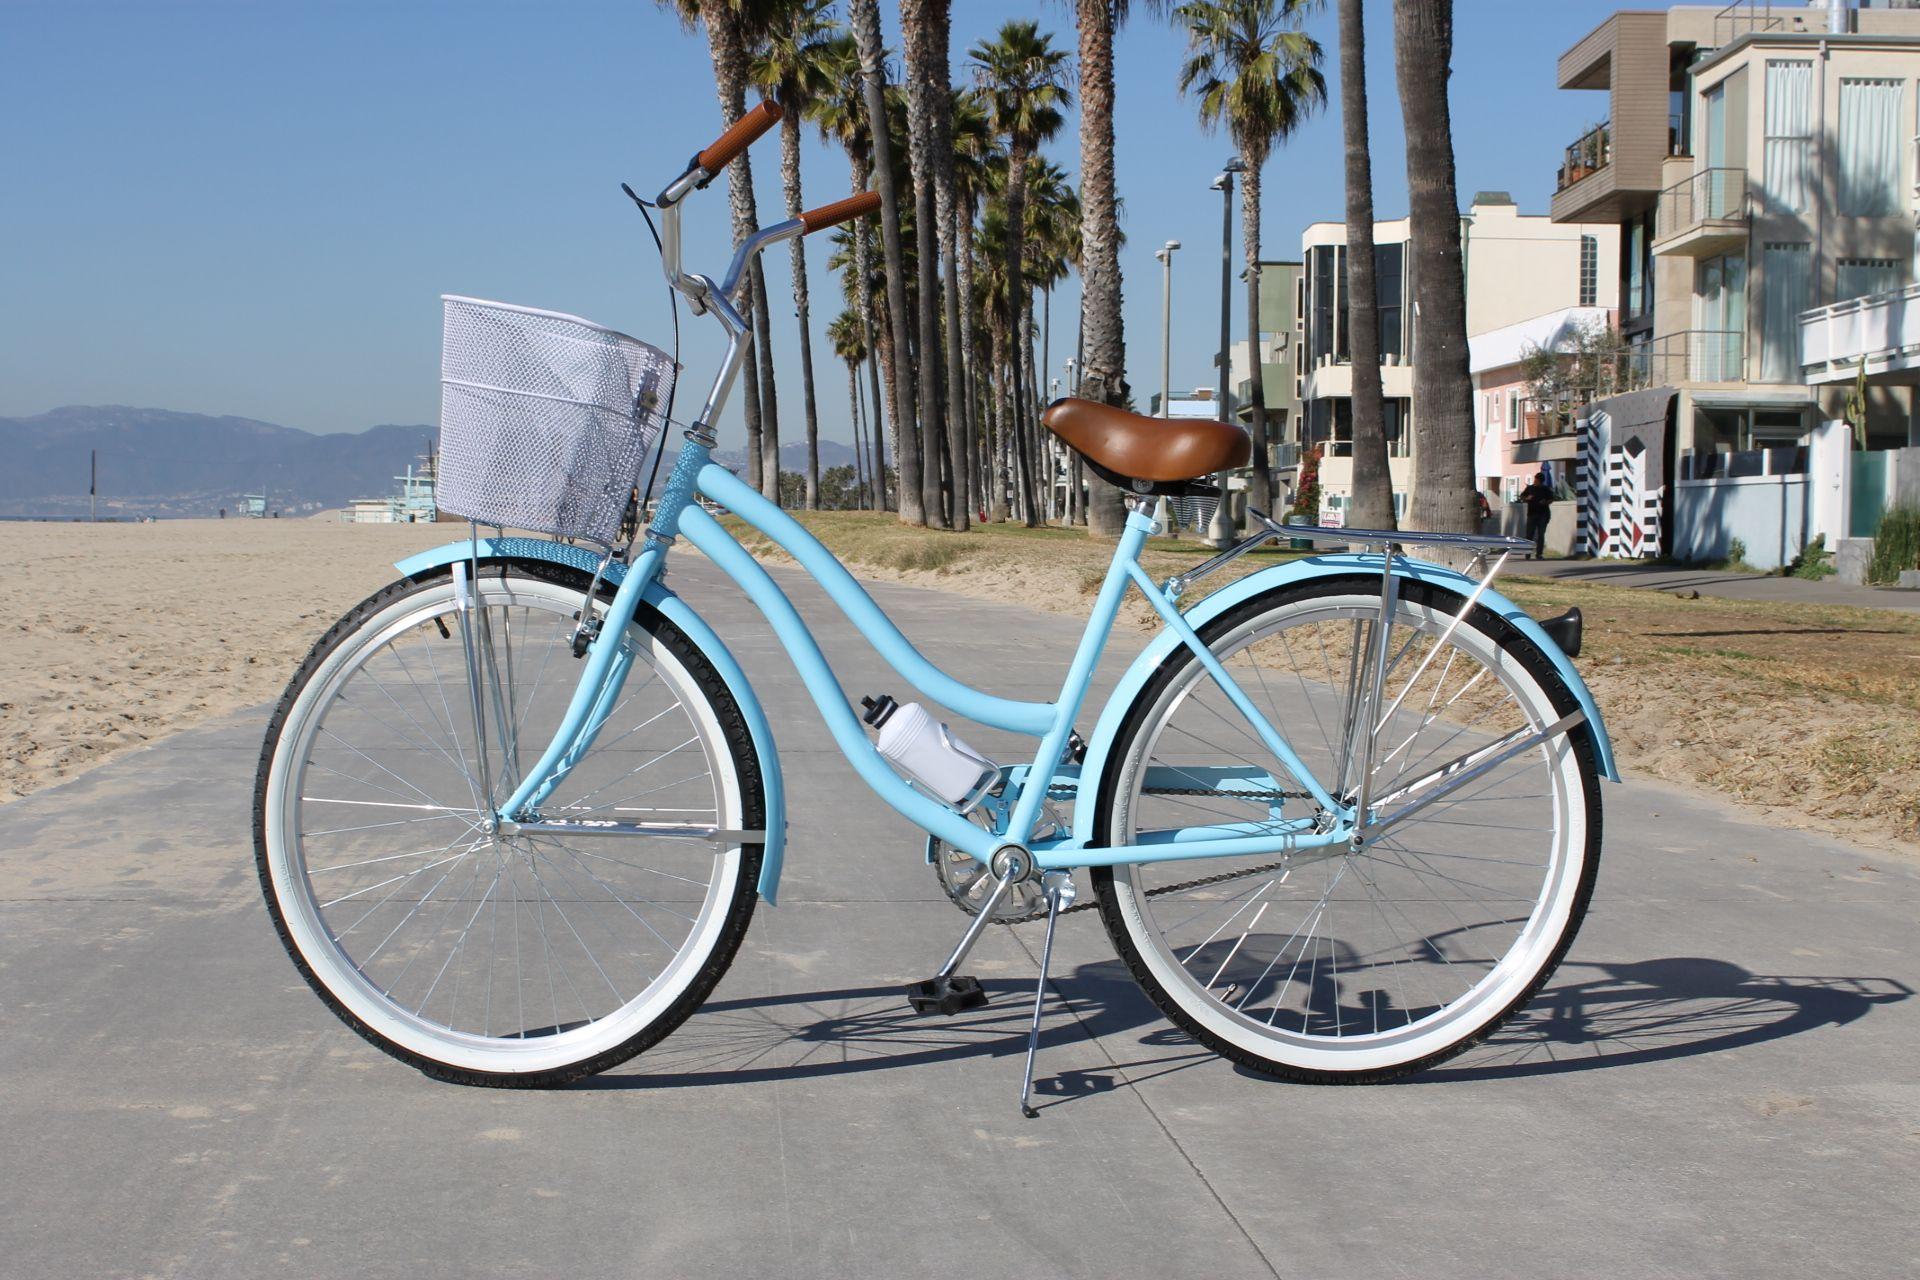 Venice Beach California Venicebeachbicycles Cruiser Bicycles Cruisers Tiffany Blue